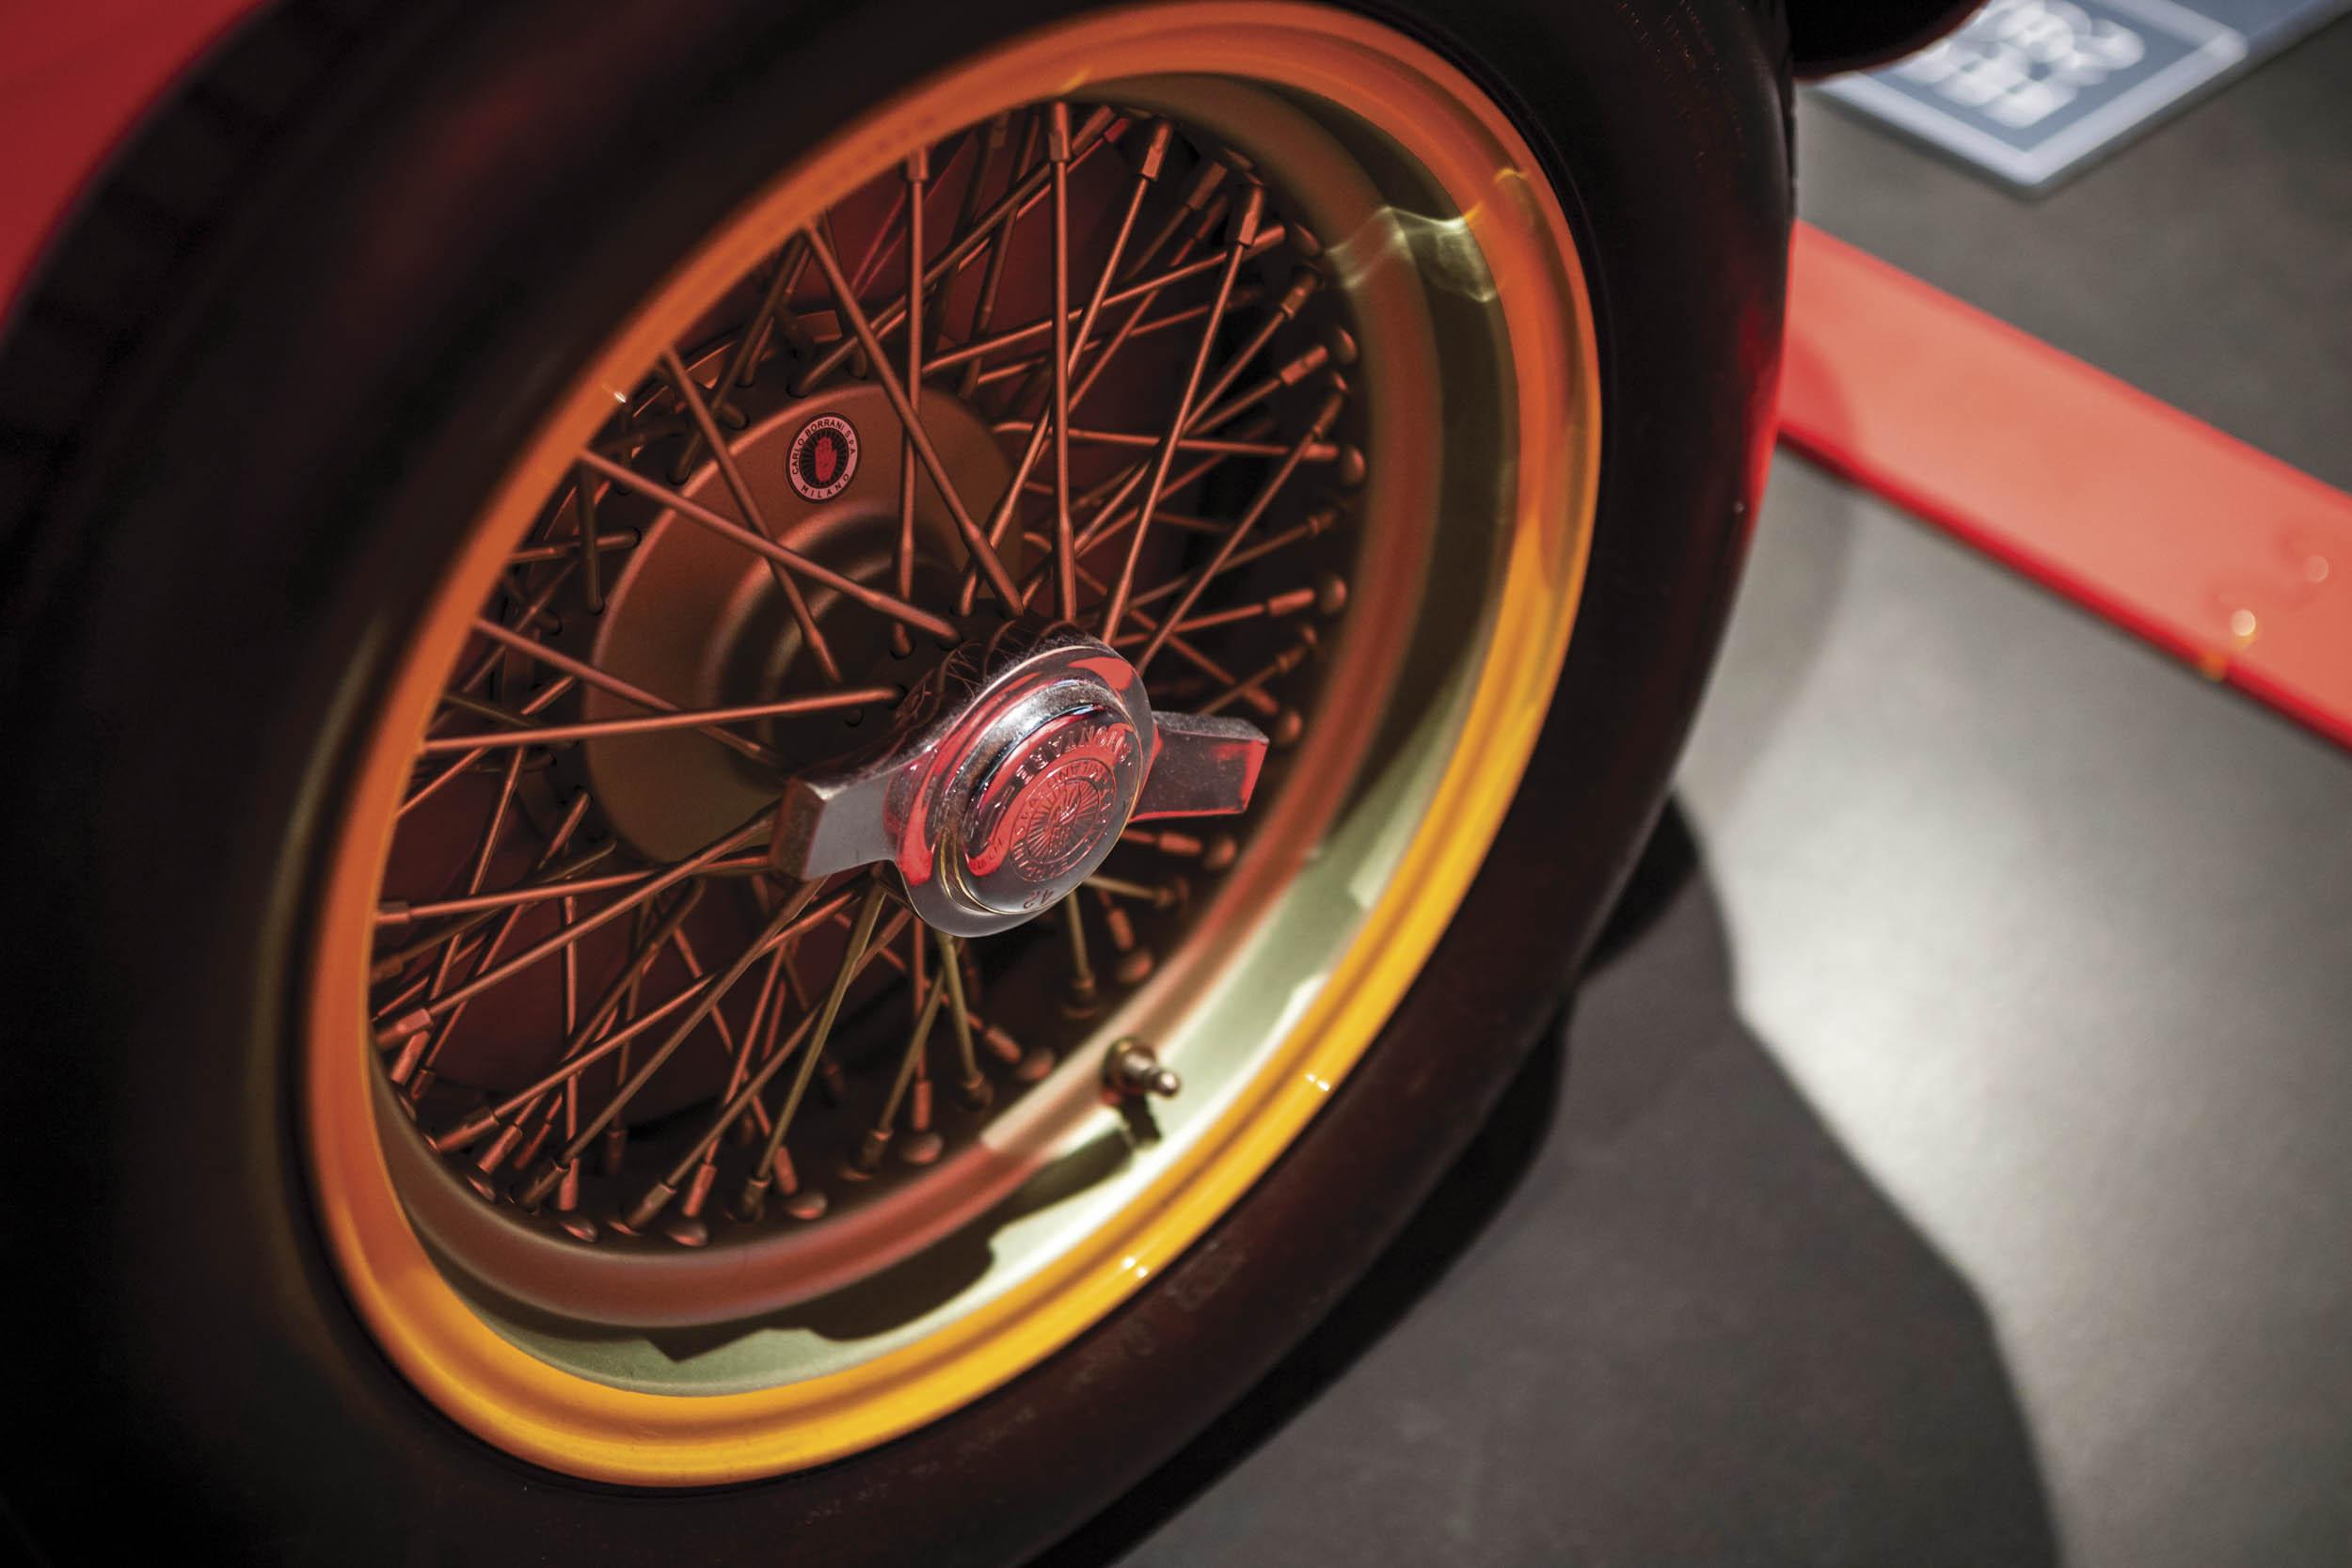 1956 Ferrari 290 MM by Scaglietti wheel detail